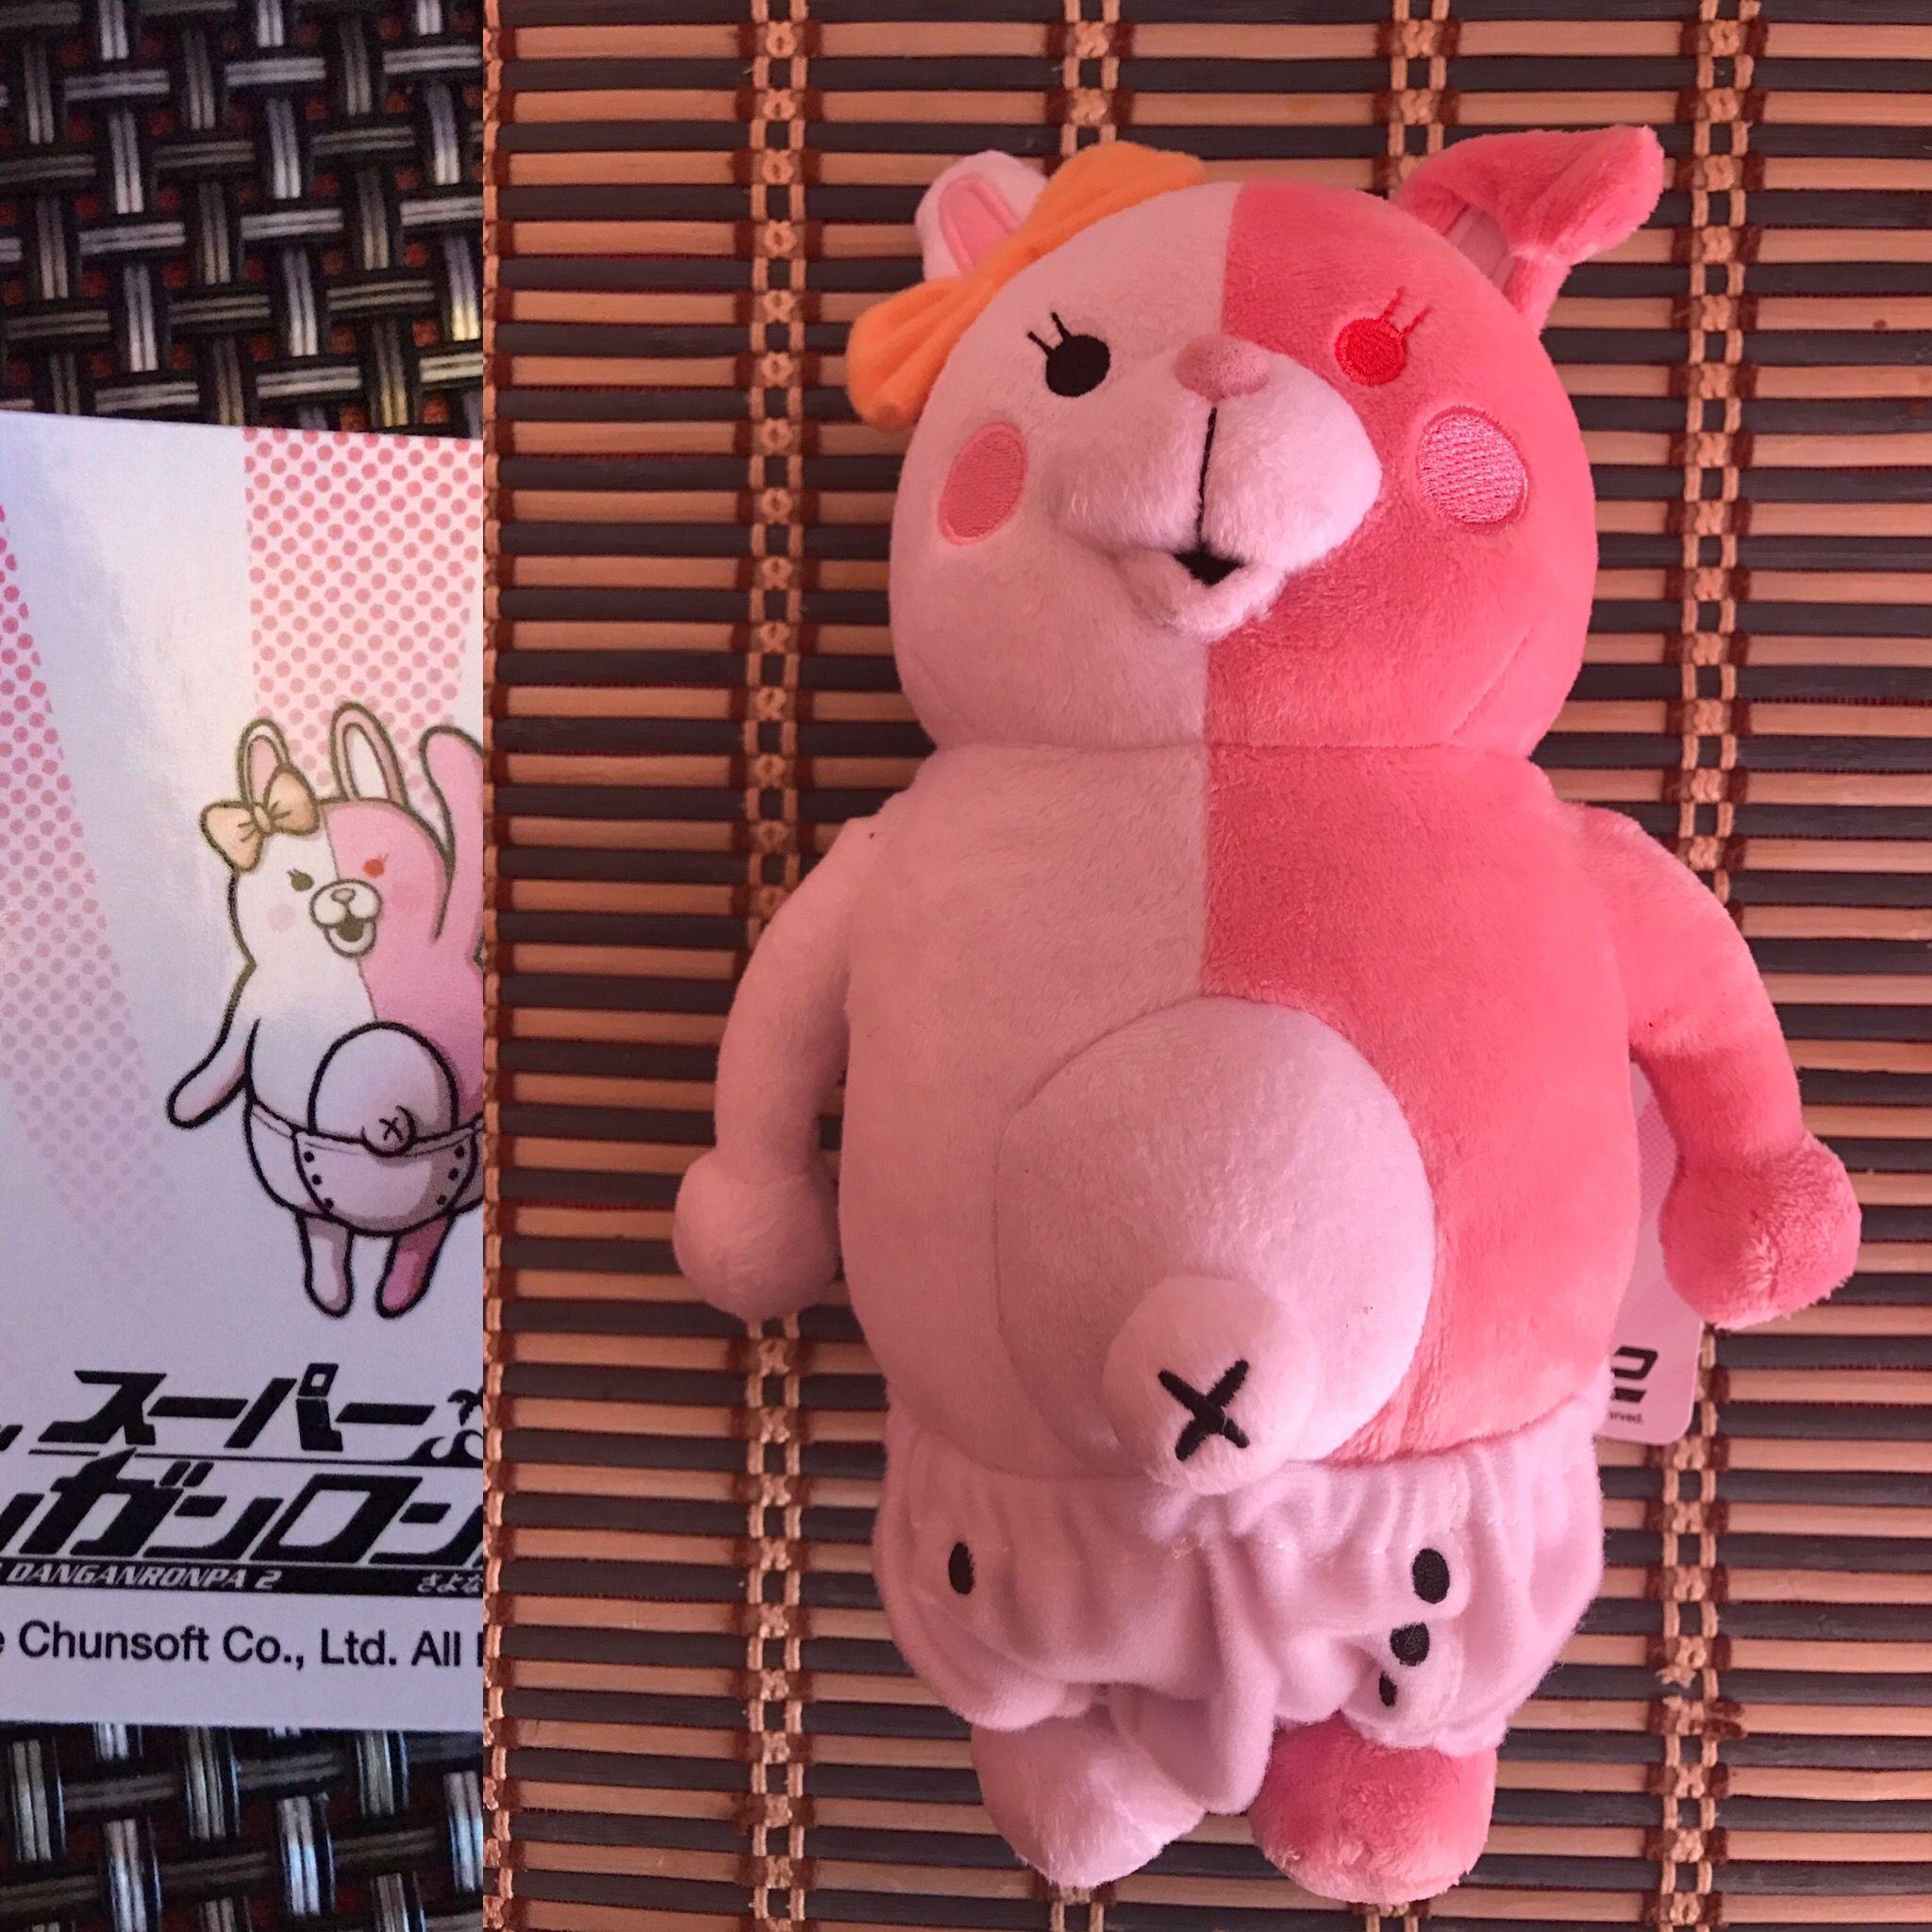 Super Danganronpa 2 : Goodbye Despair Monomi plush